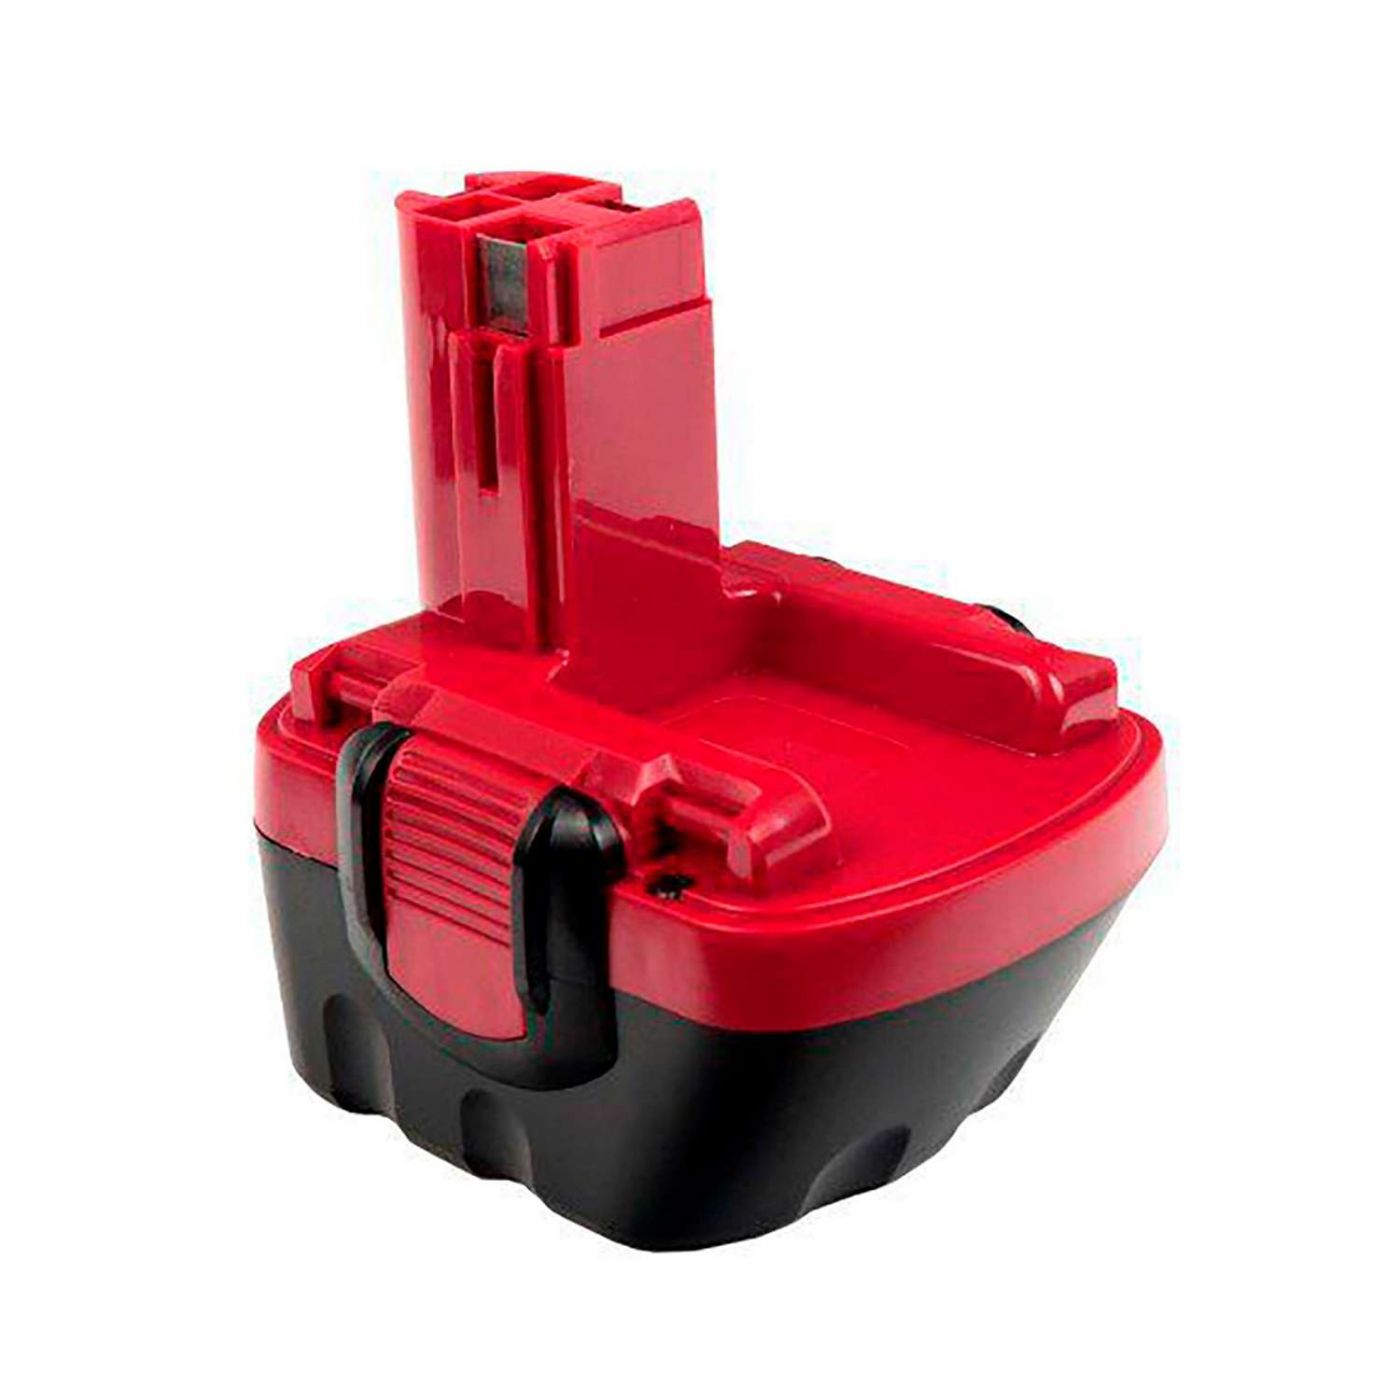 Аккумулятор Практика для BOSCH 12В, 1,5 Ач, NiCd блистер (030-856)